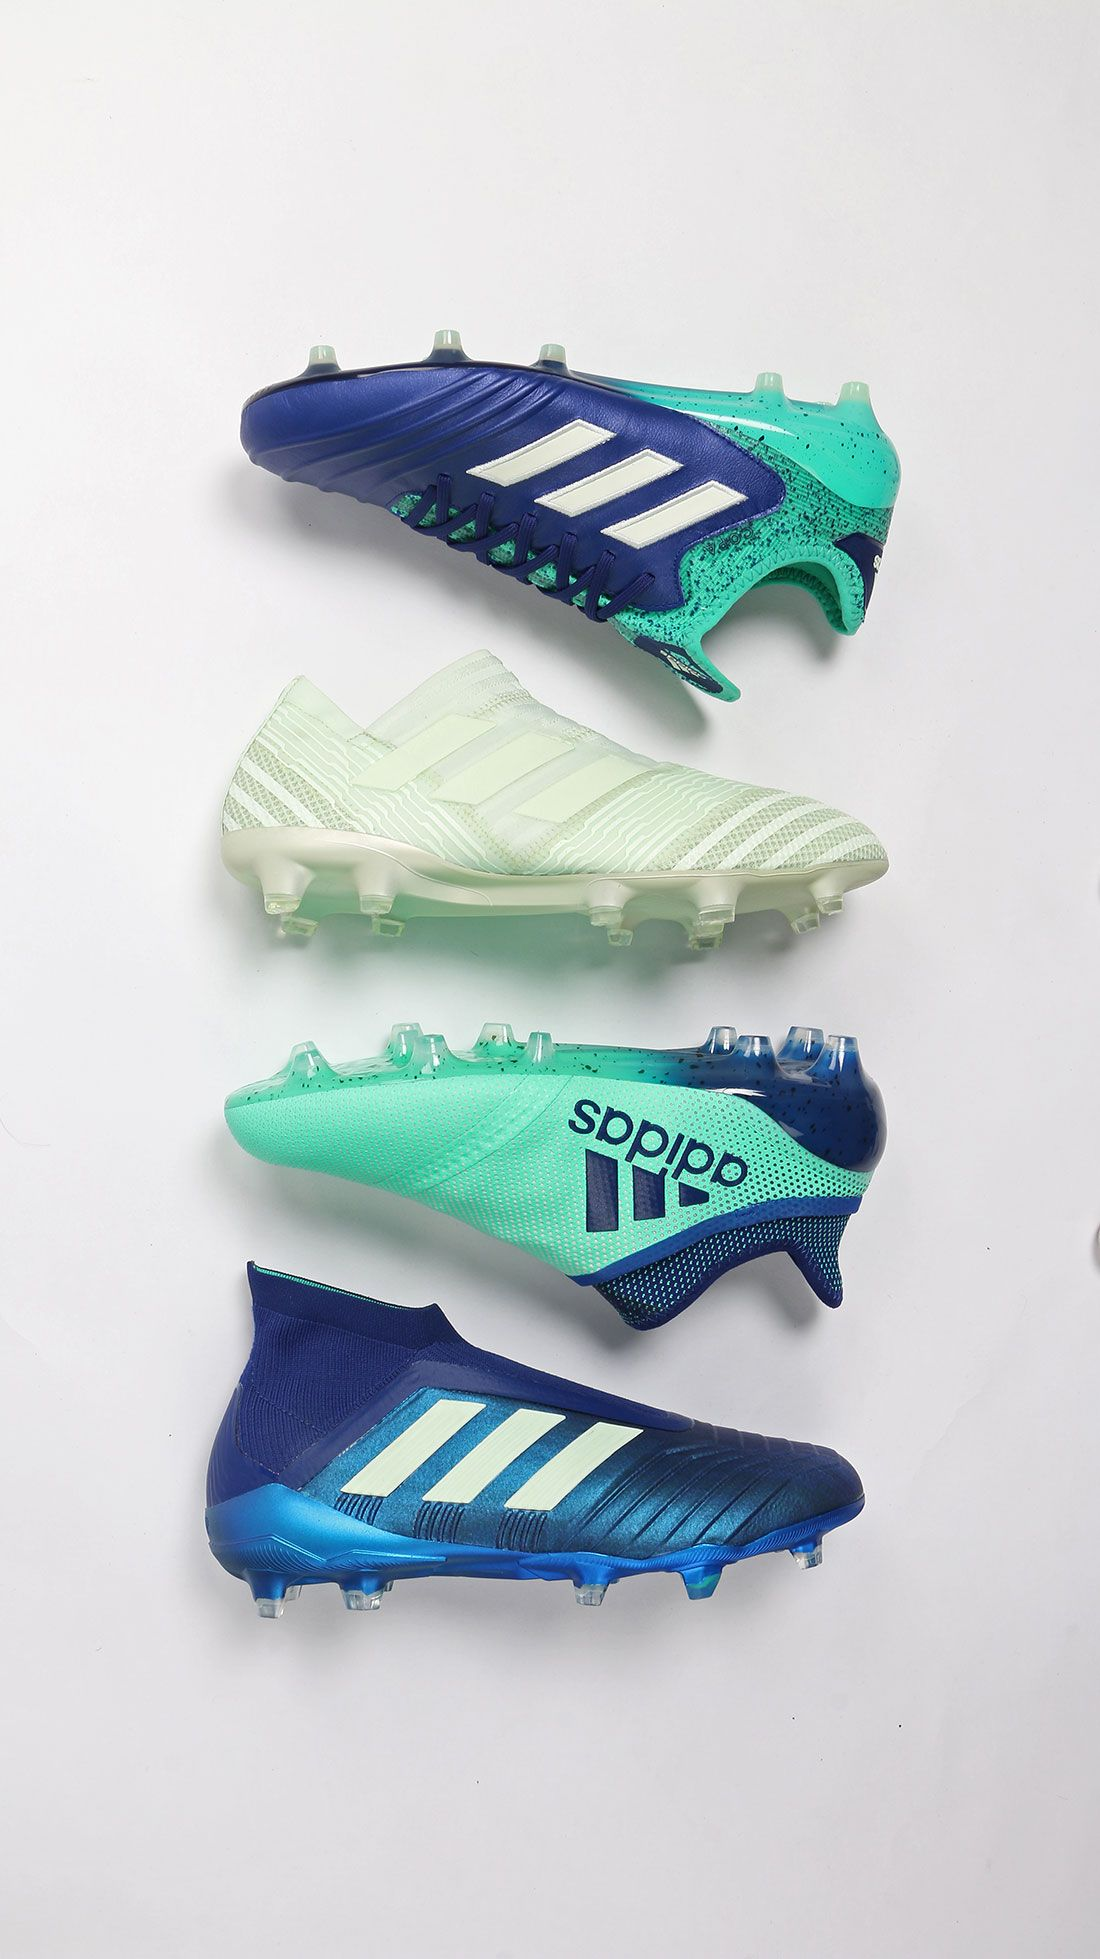 931db084eab Colección de botas de fútbol con tacos adidas deadly strike. Foto: Marcela  Sansalvador para futbolmania.com #adidas #deadlystrike #futbolmania # ...